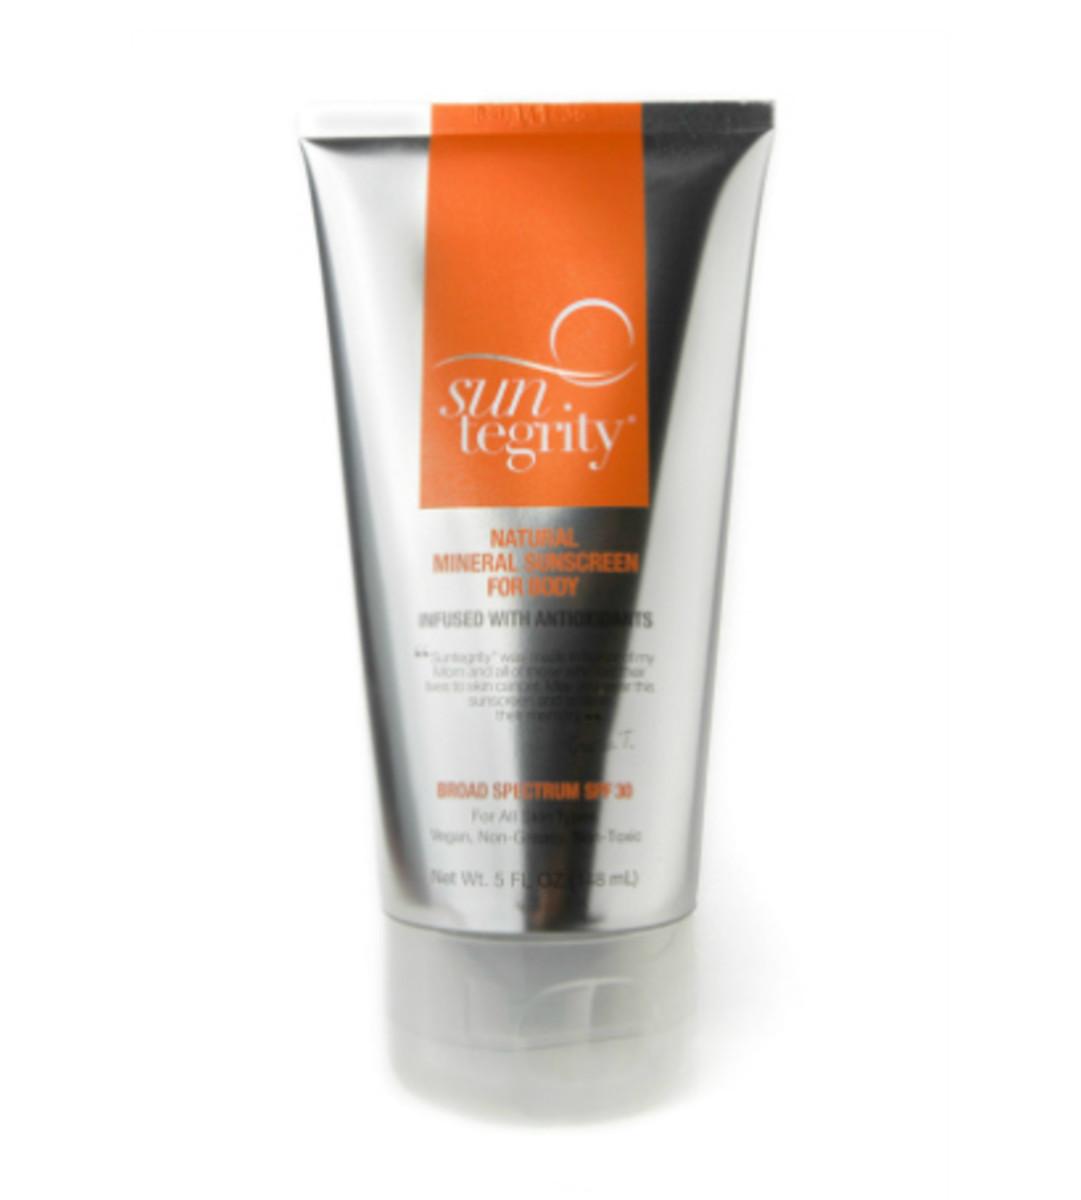 Natural Sunscreen Suntegrity Body 30